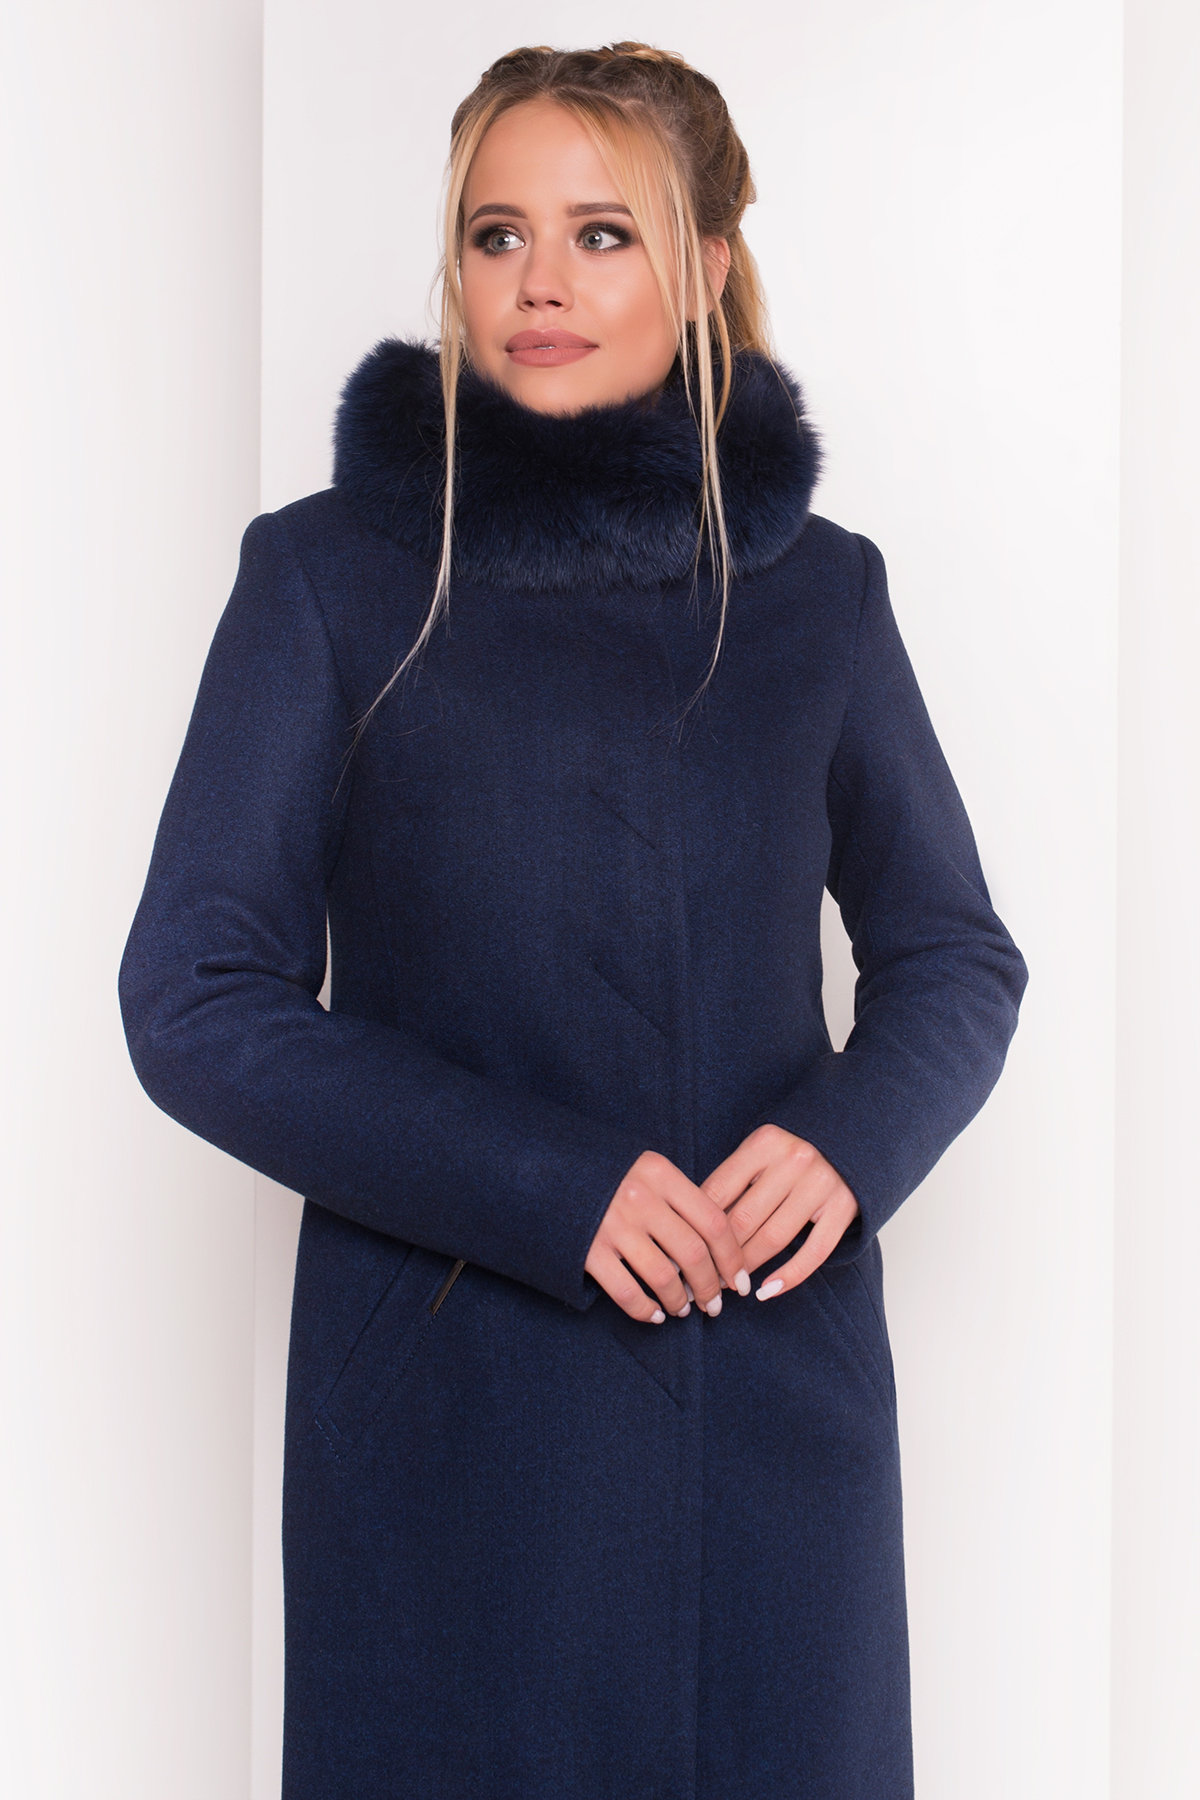 Пальто зима Люцея 5513 АРТ. 37046 Цвет: Темно-синий 17 - фото 4, интернет магазин tm-modus.ru